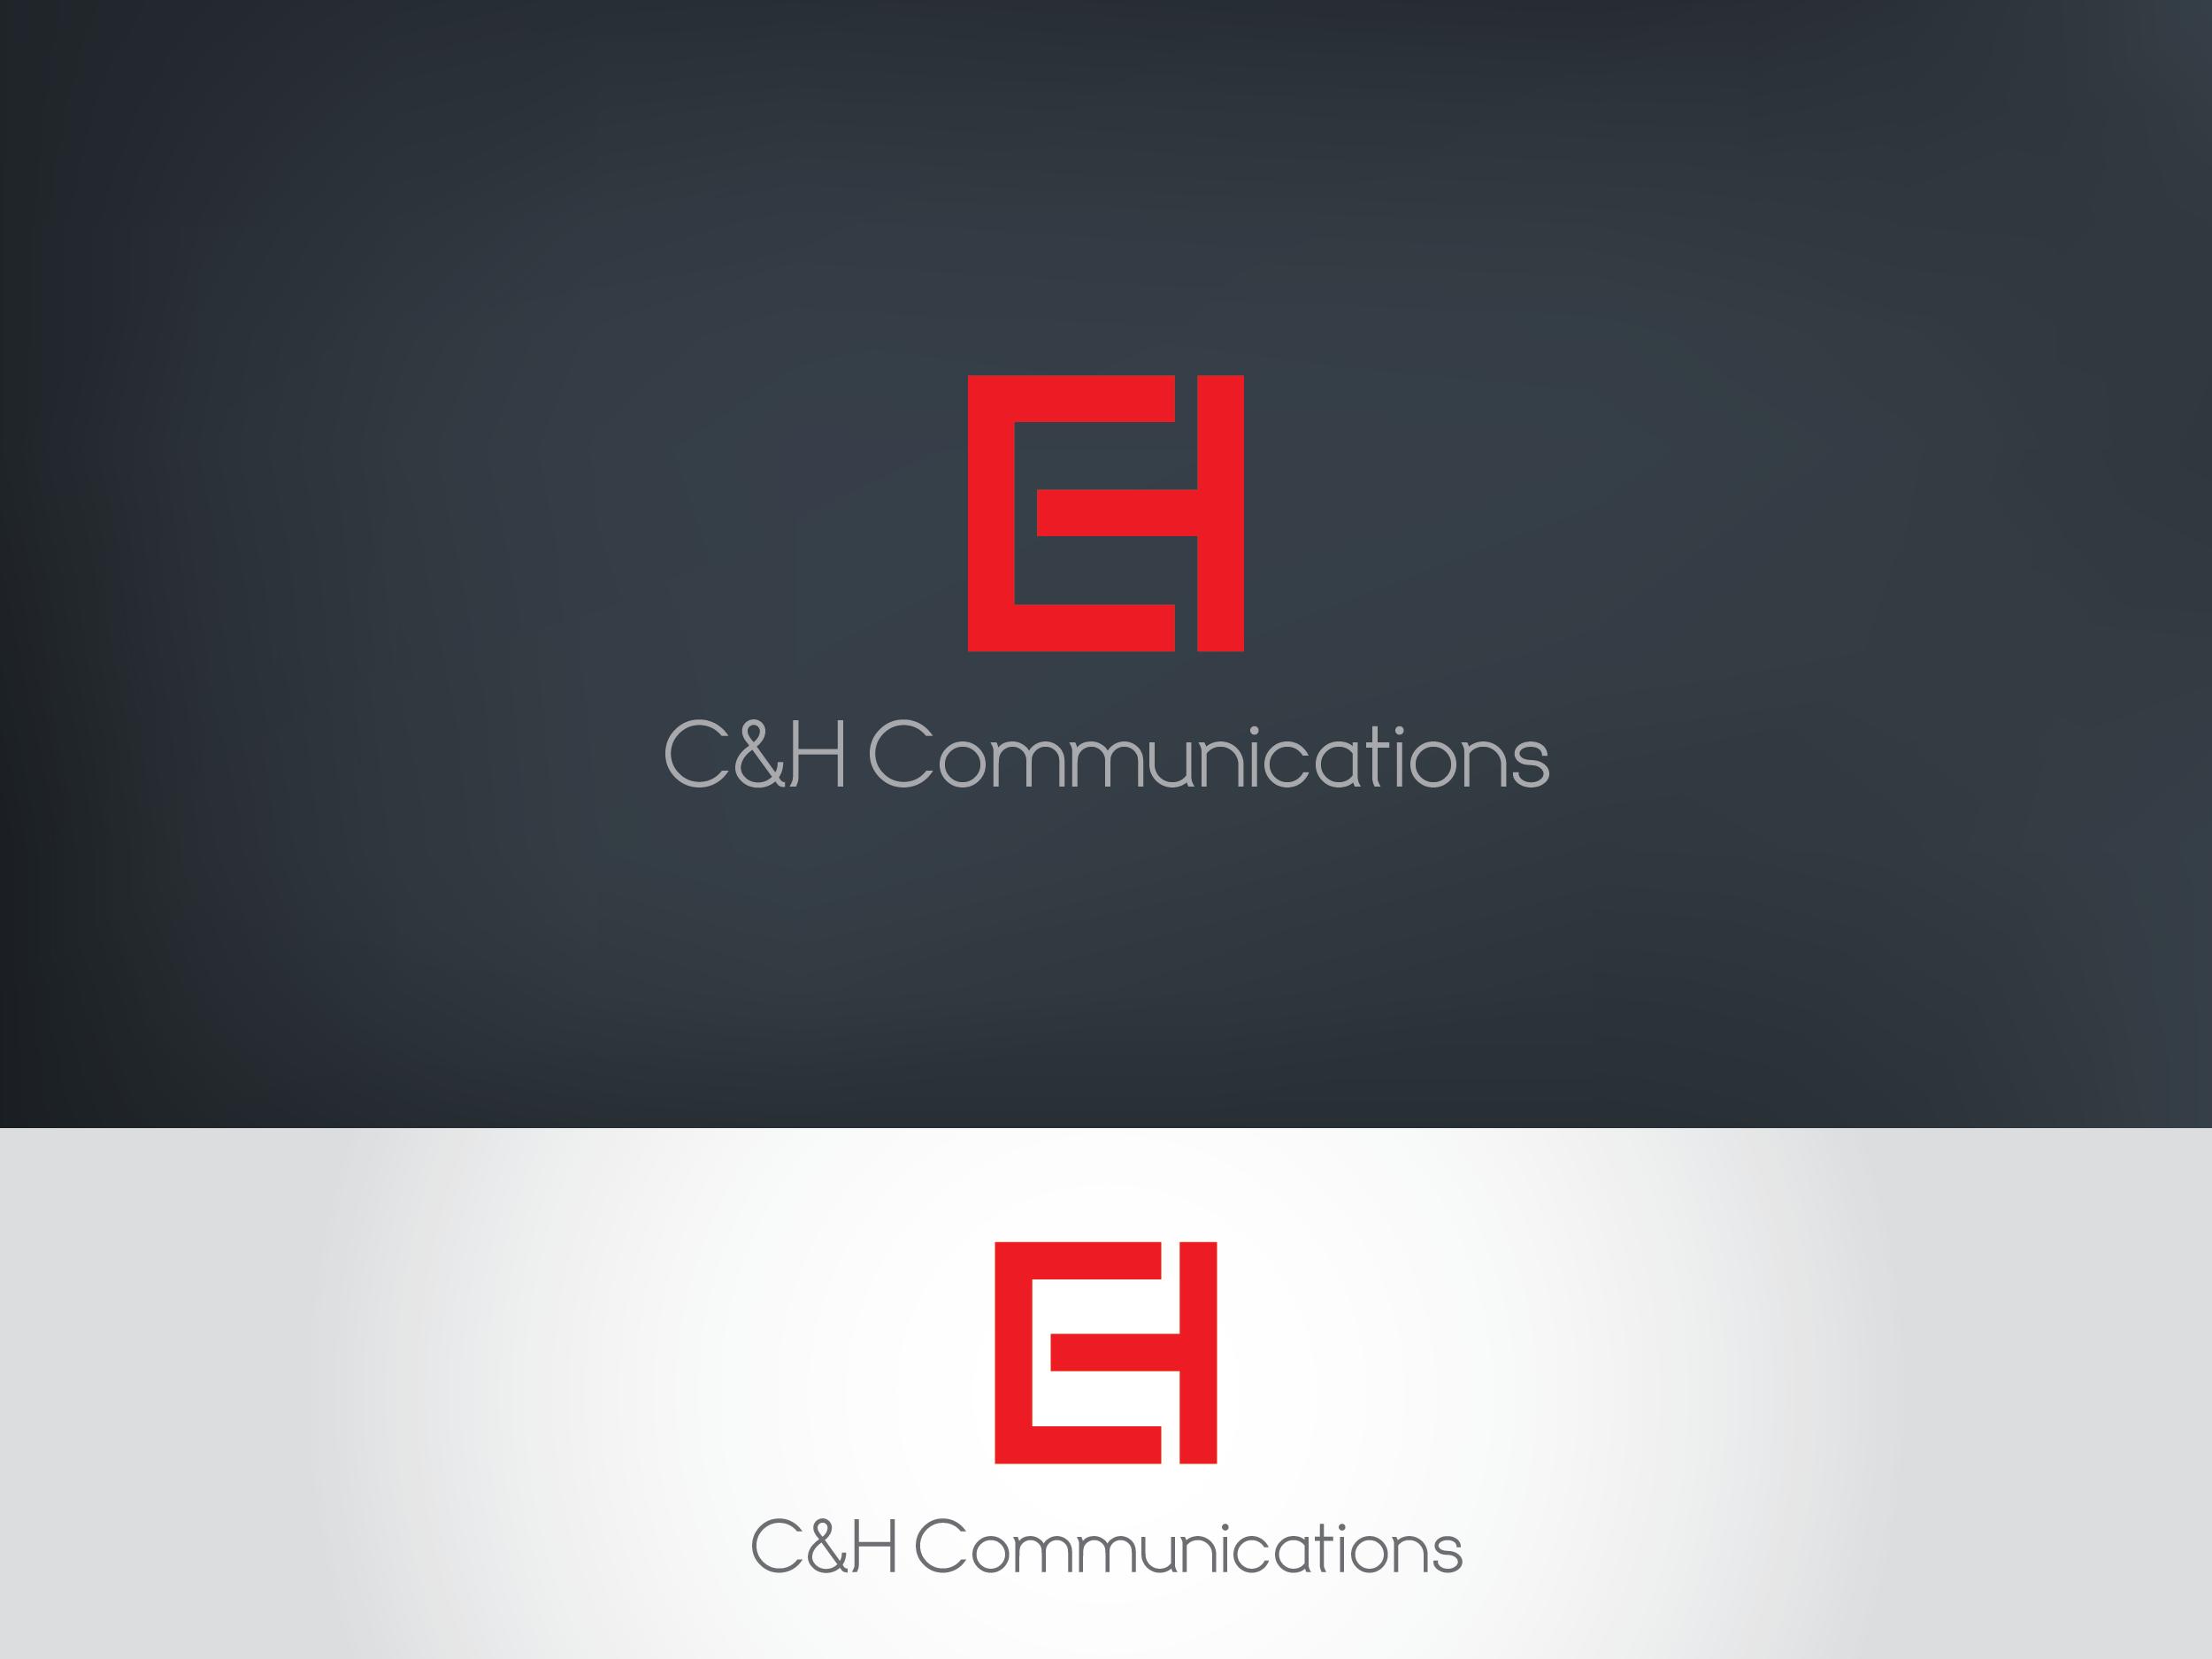 Logo Design by Shahab Uddin - Entry No. 27 in the Logo Design Contest Artistic Logo Design for C&H Communications.